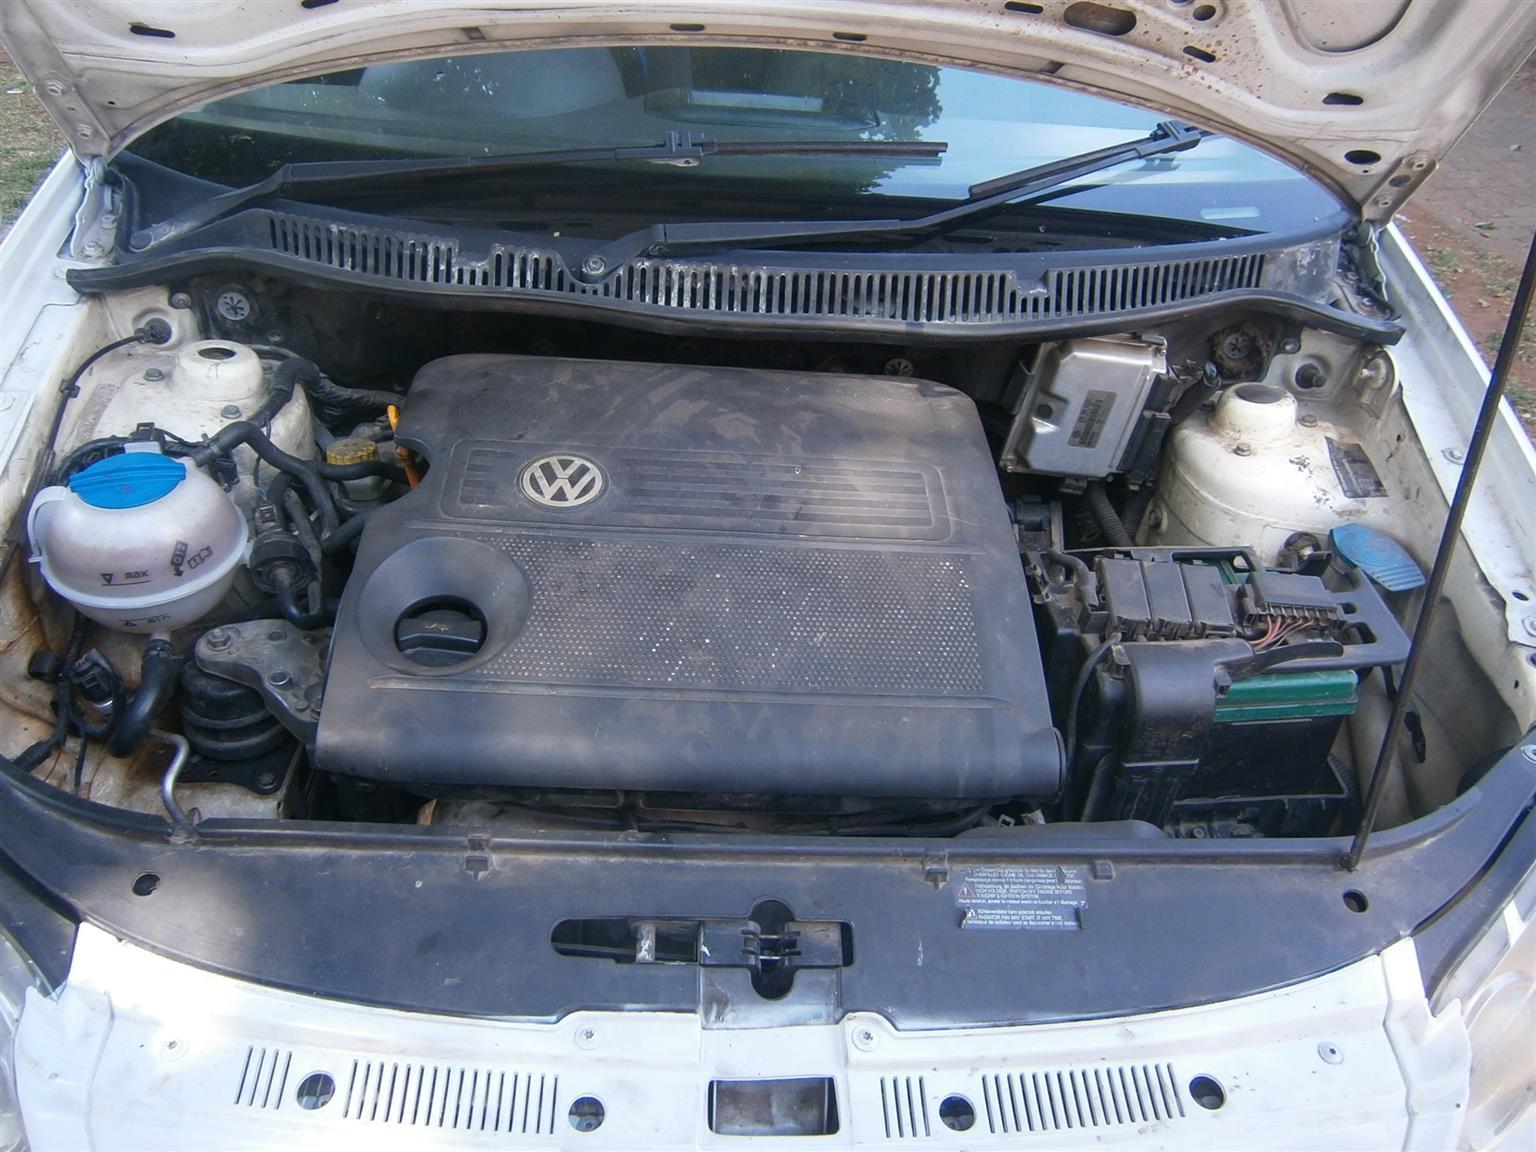 2006 VW Polo 1.4 Comfortline